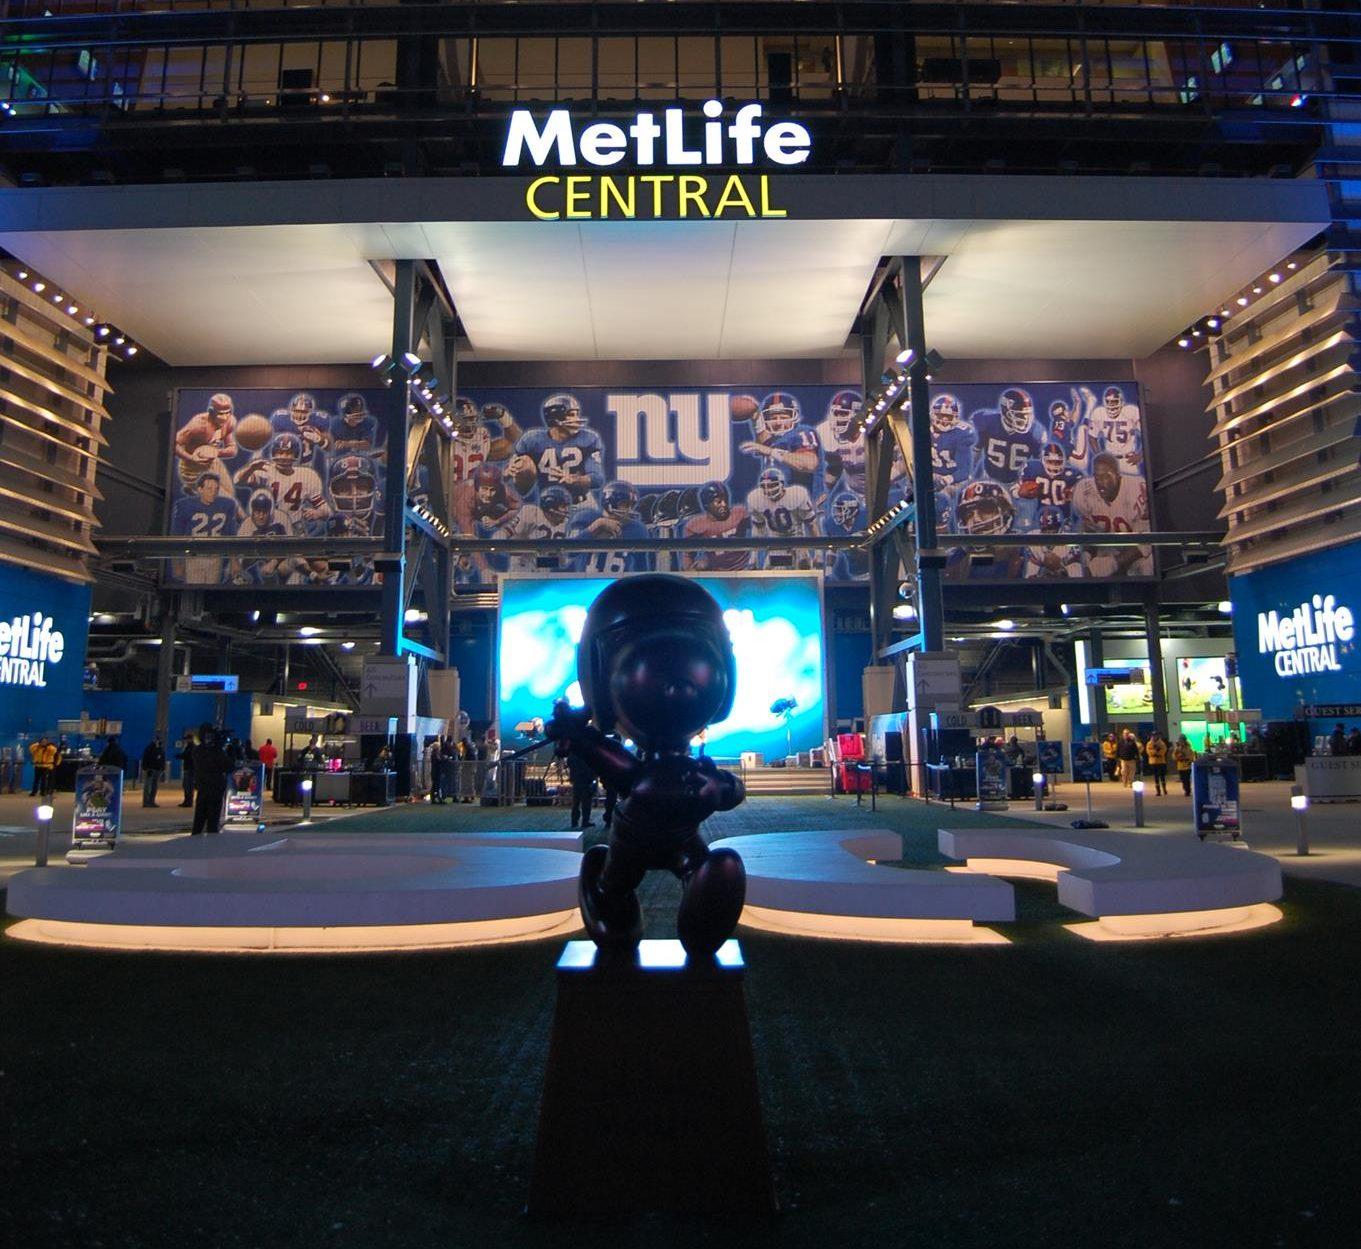 MetLife Central stadium